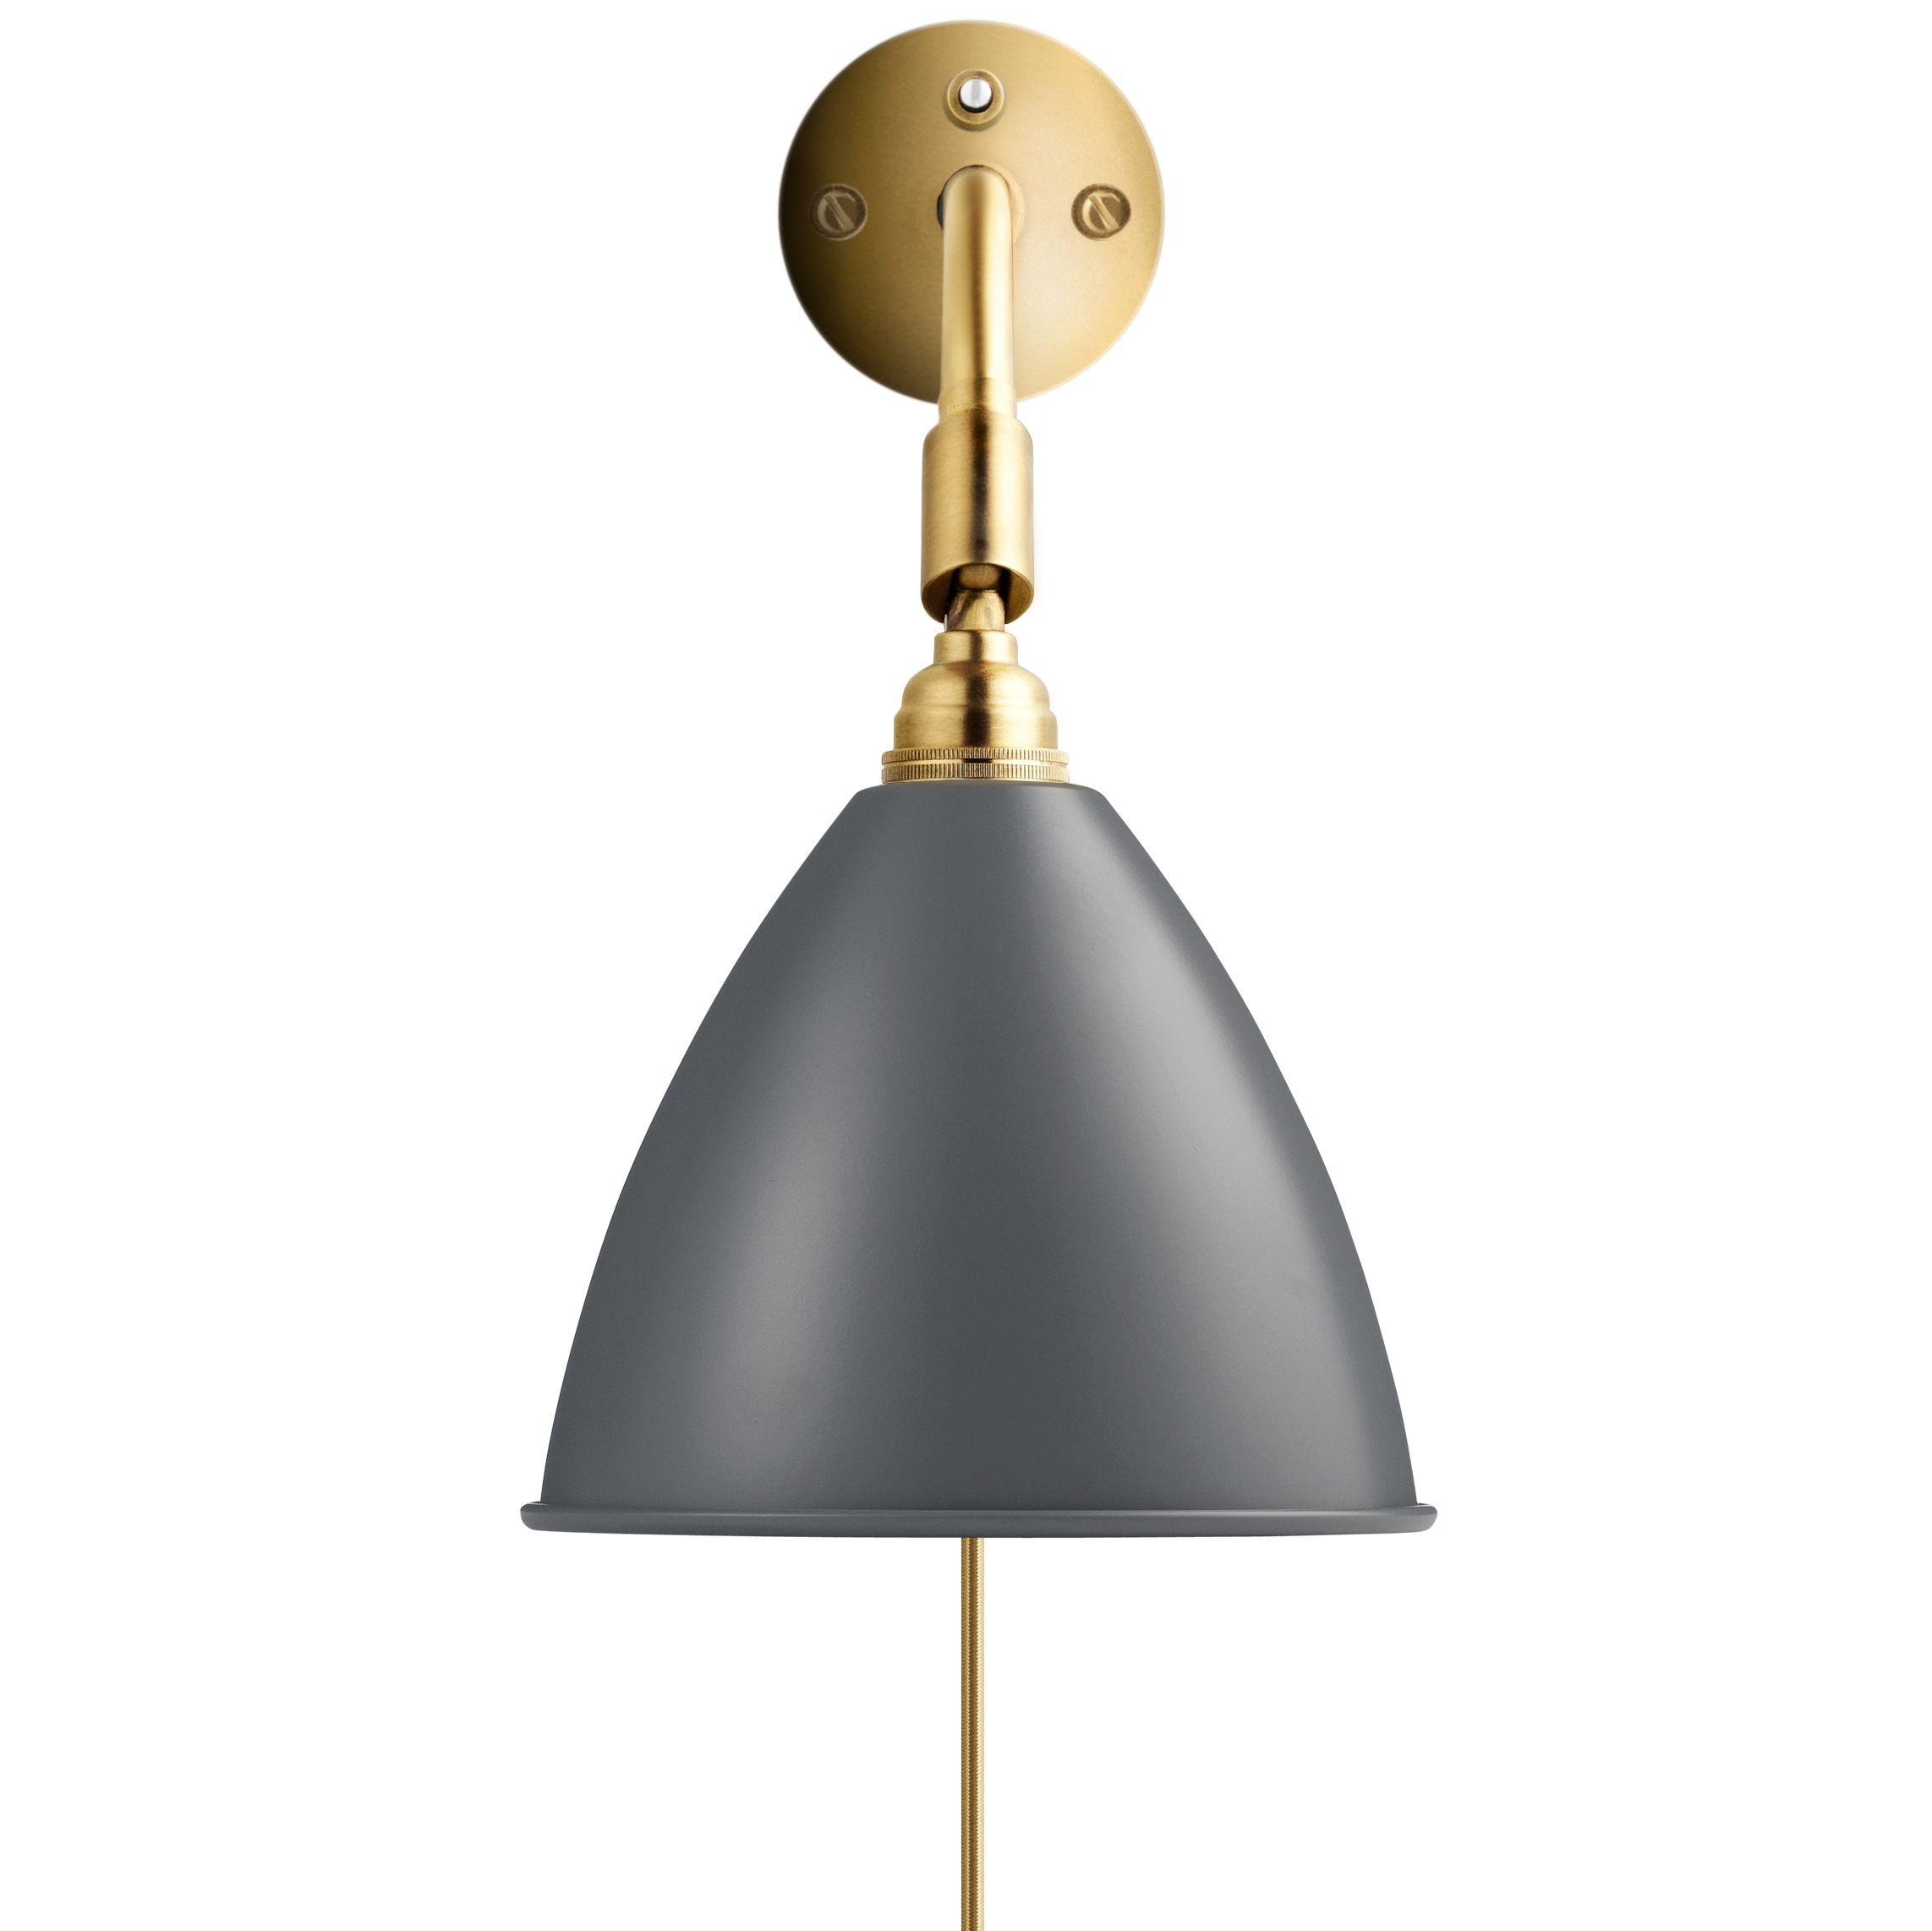 Gubi Bestlite BL7 wandlamp grijs/messing met stekker